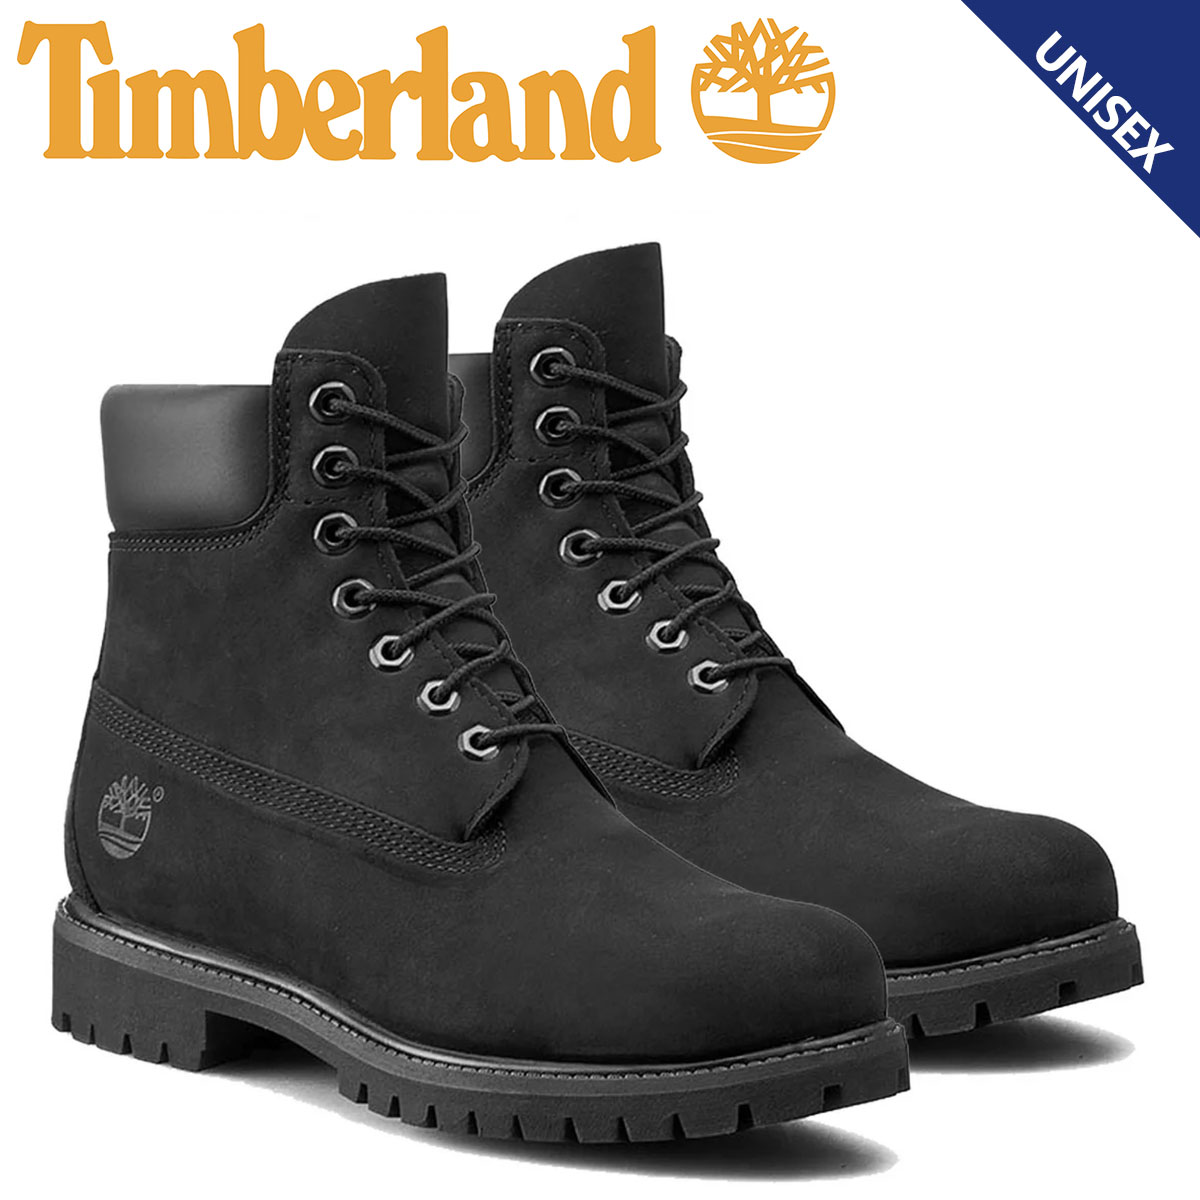 Point 2 x waterproof Timberland Timberland 6 inch premium boots INCH  PREMIUM WATERPROOF BOOTS nubuck mens Womens waterproof 10073 black unisex   10   9 new ... 4c9e3adac4d02